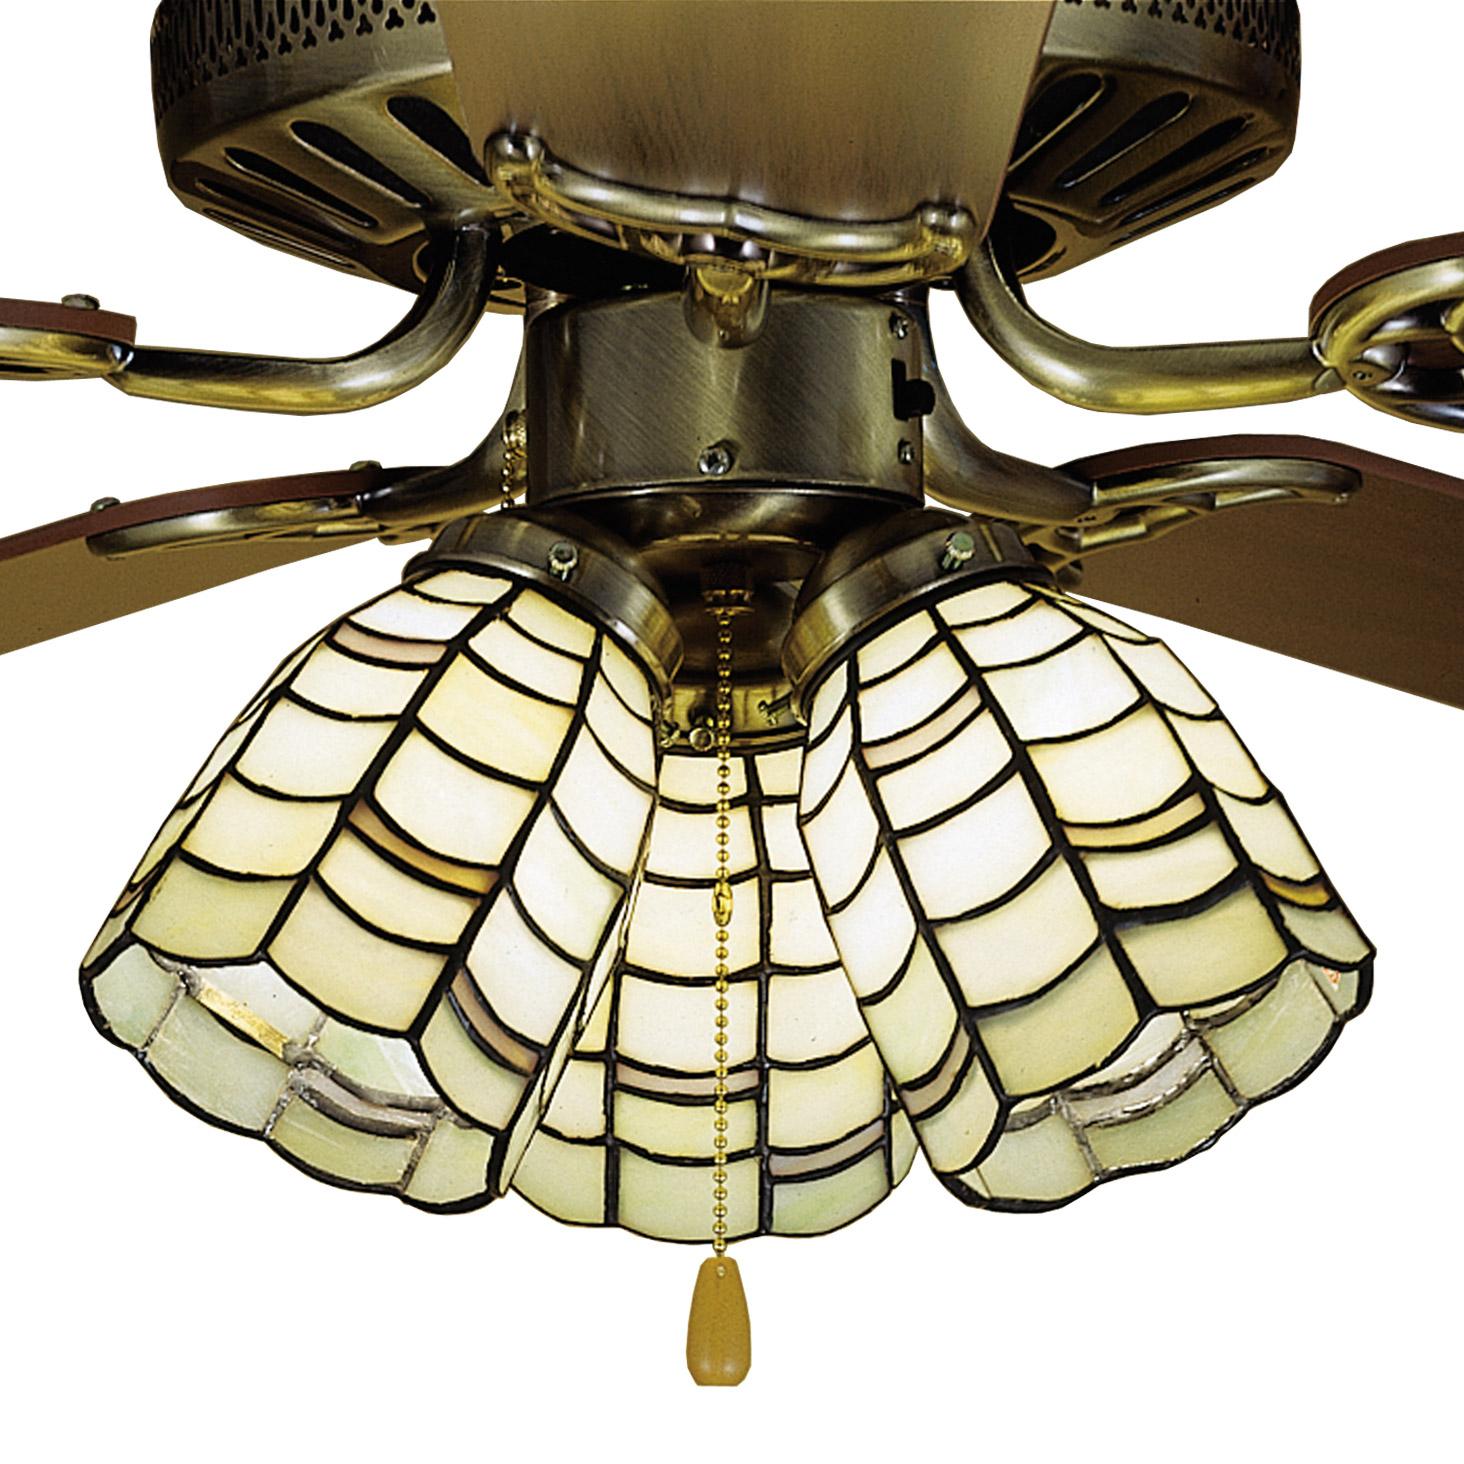 Meyda 27479 Tiffany Sea Scallop Fan Light Shade